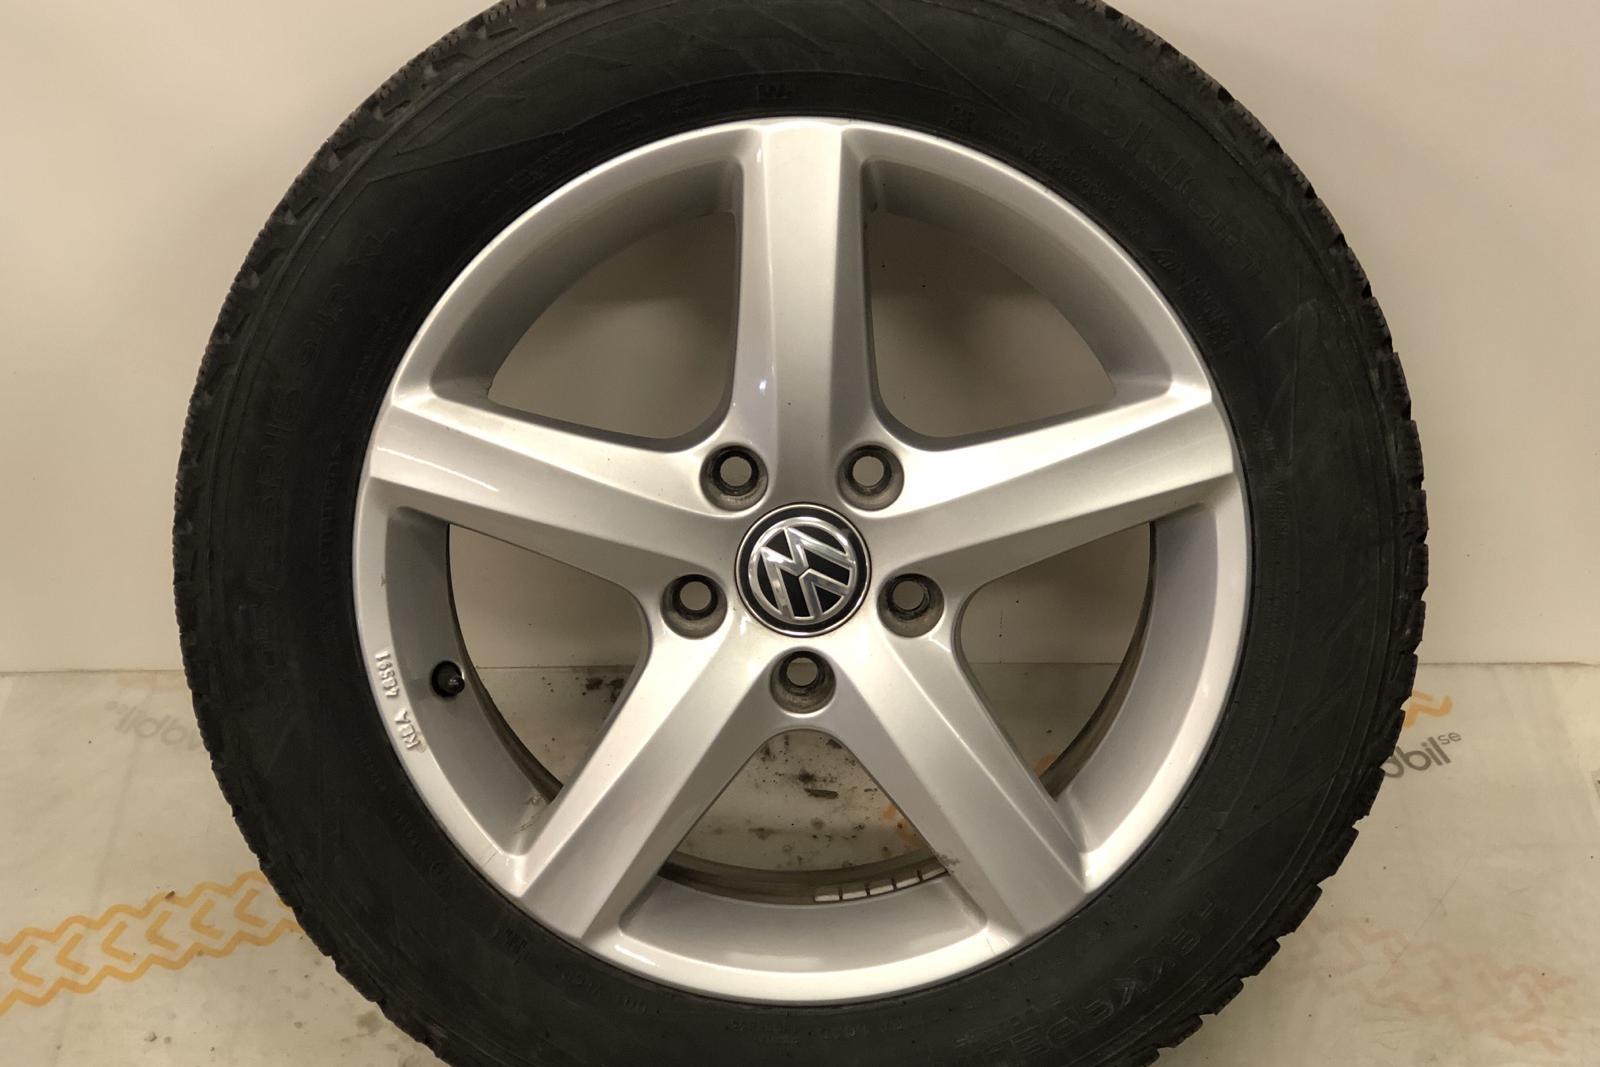 VW Golf VII 1.4 Plug-in-Hybrid 5dr (204hk) - 5 500 mil - Automat - grå - 2015